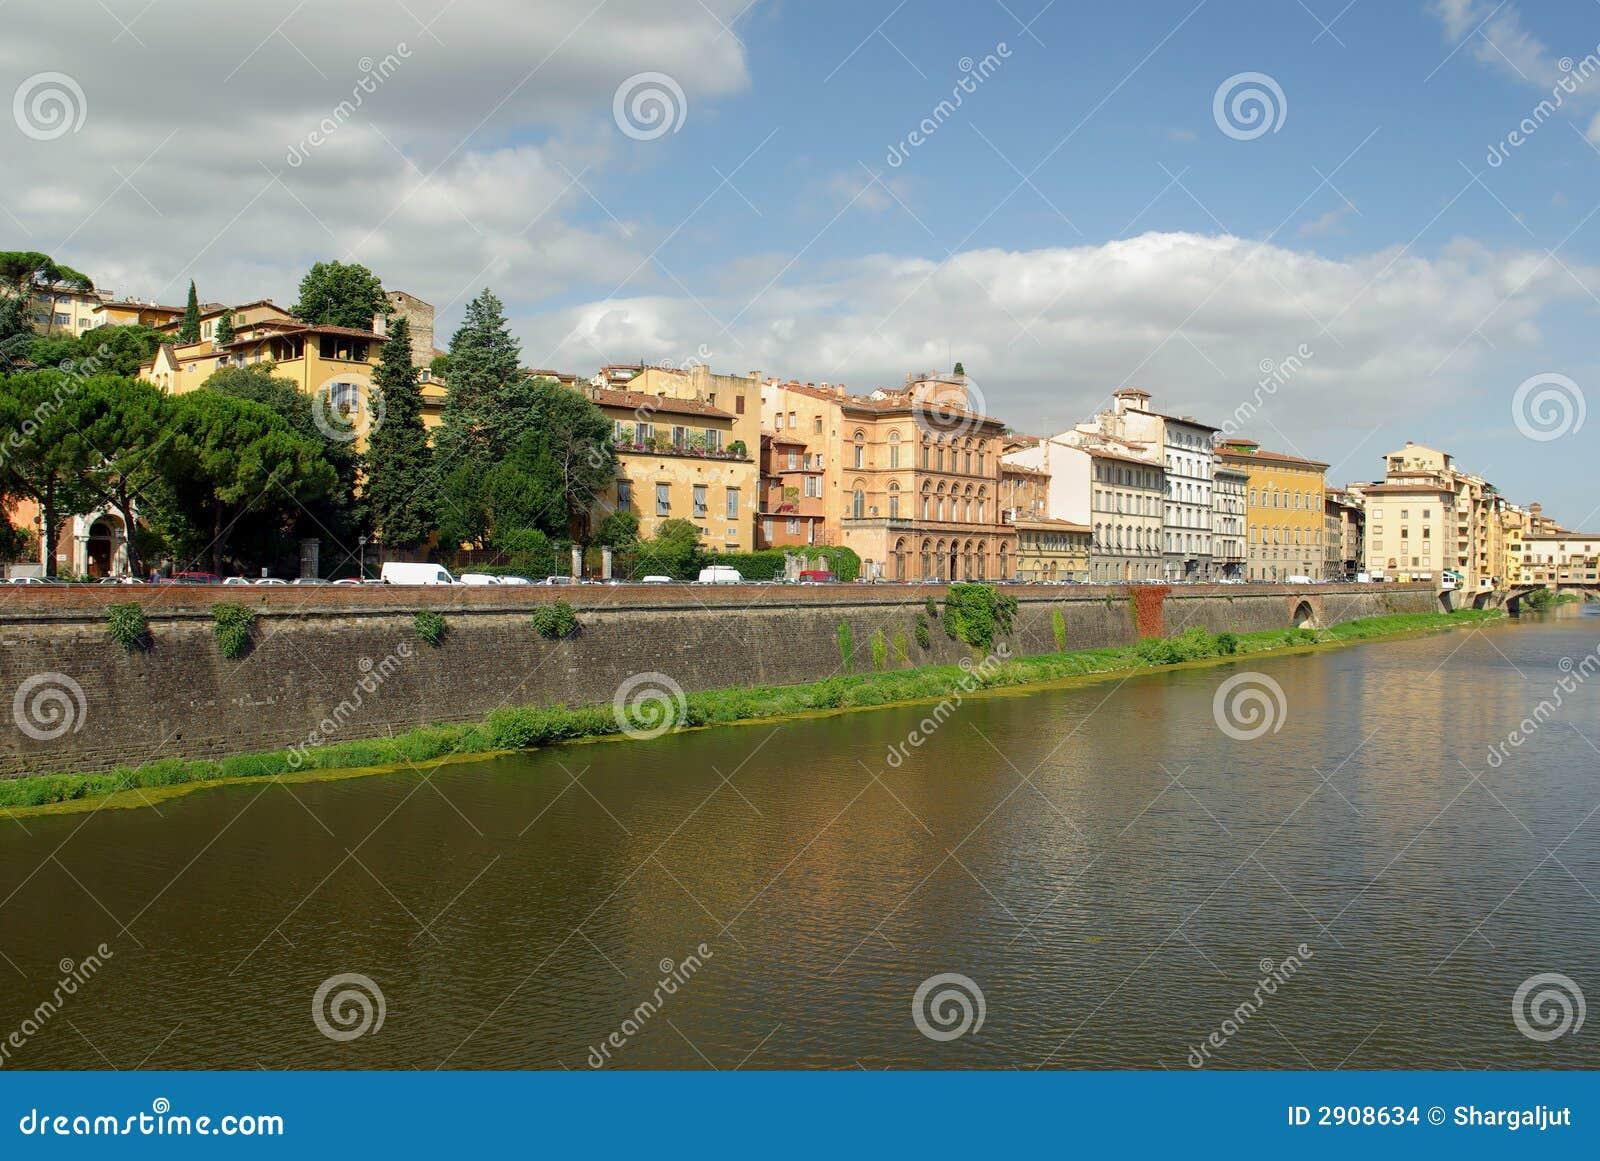 Fleuve d Arno, Florence, Italie